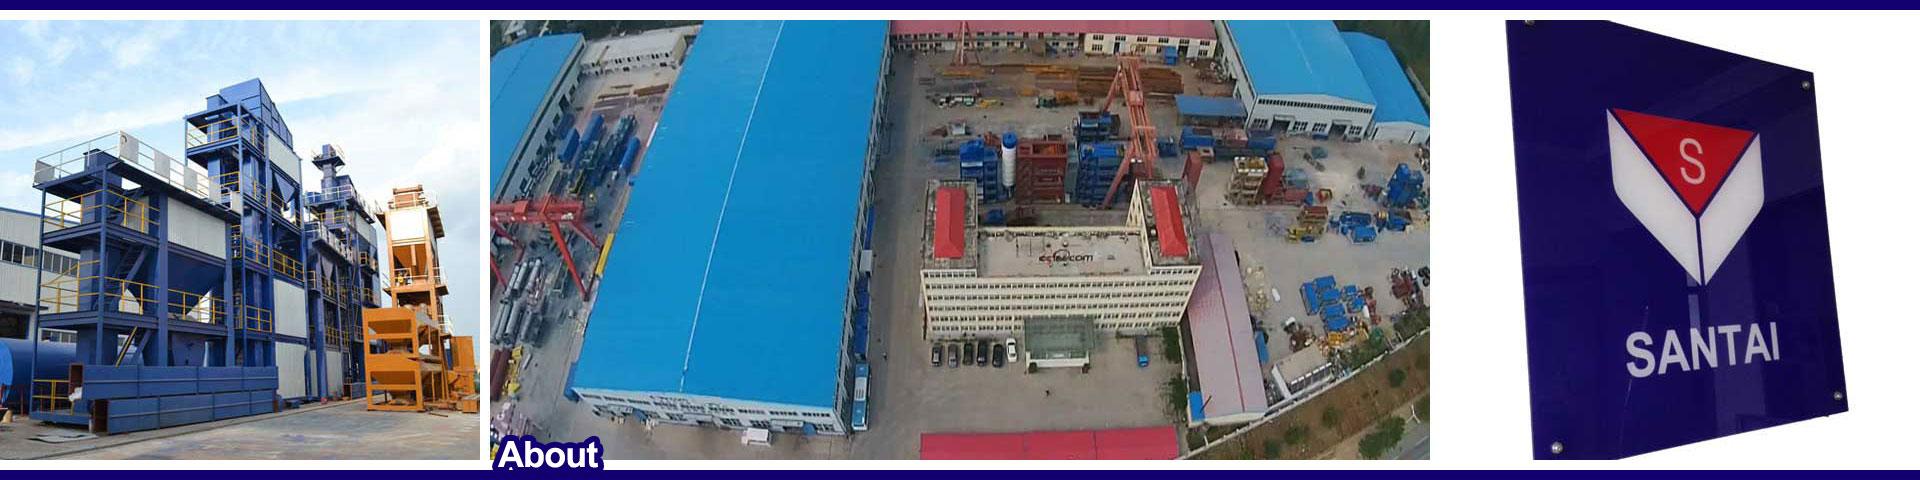 Gongyi Santai Machinery Co Ltd